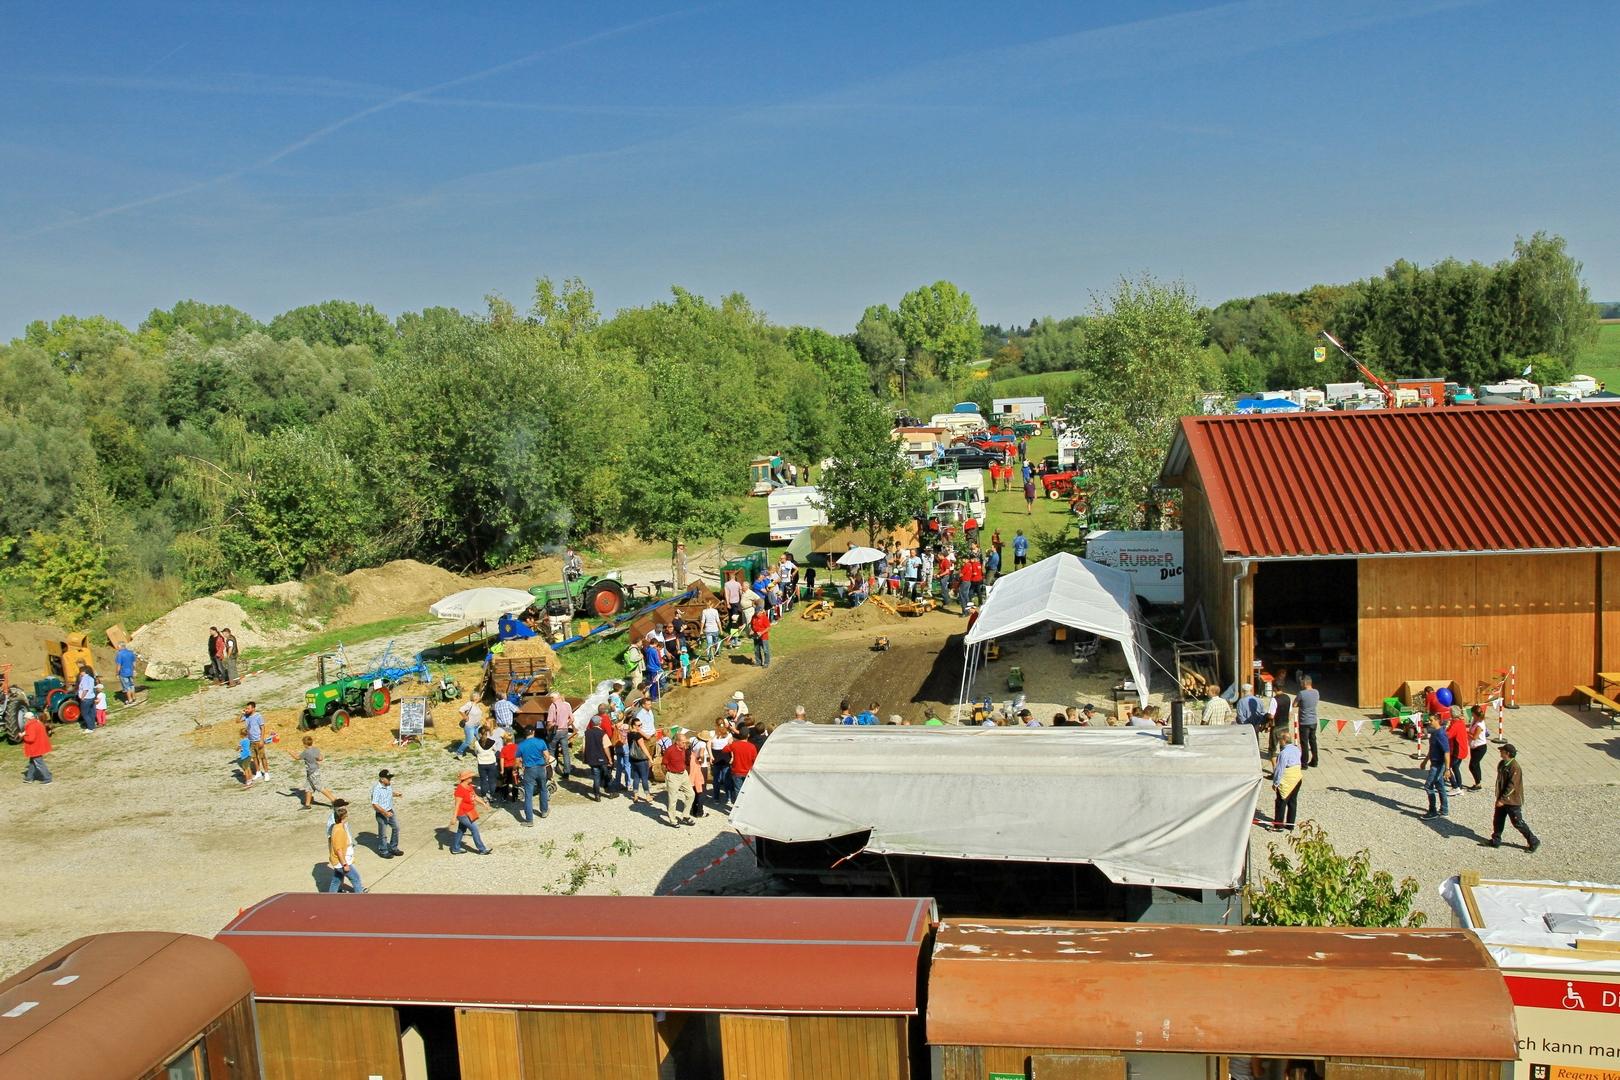 2018_09_14-16 Schleppertreffen Schmiechen  1044